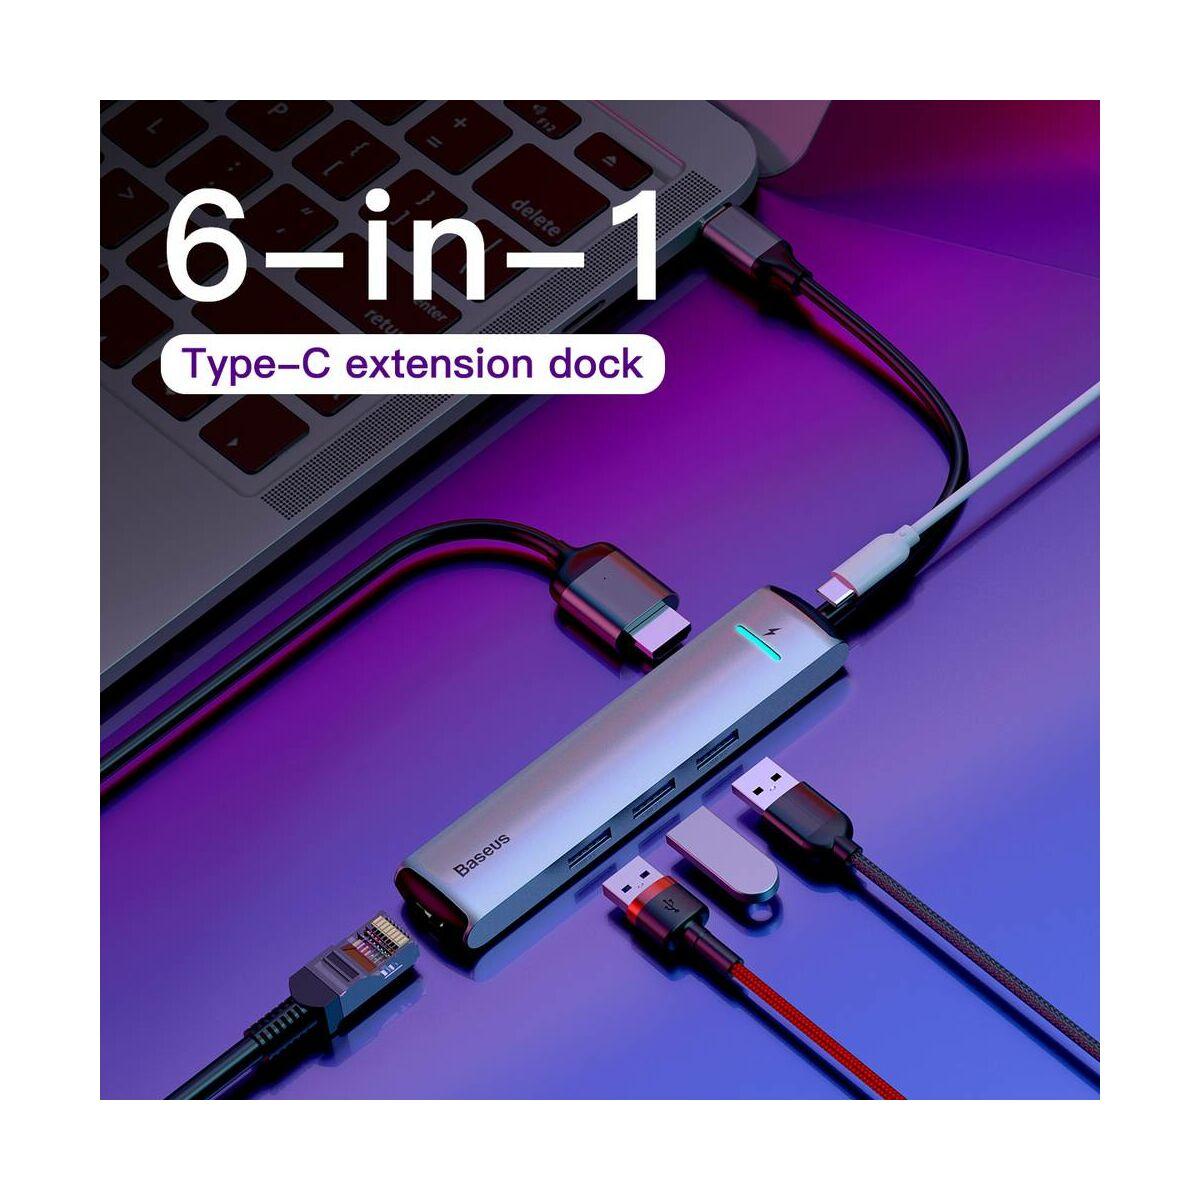 Baseus HUB, Mechanical 6-in-1 (Type-C bemenetről - PD/HDMI/3xUSB3.0/RJ45 Ethernet) adapter, szürke (CAHUB-J0G)